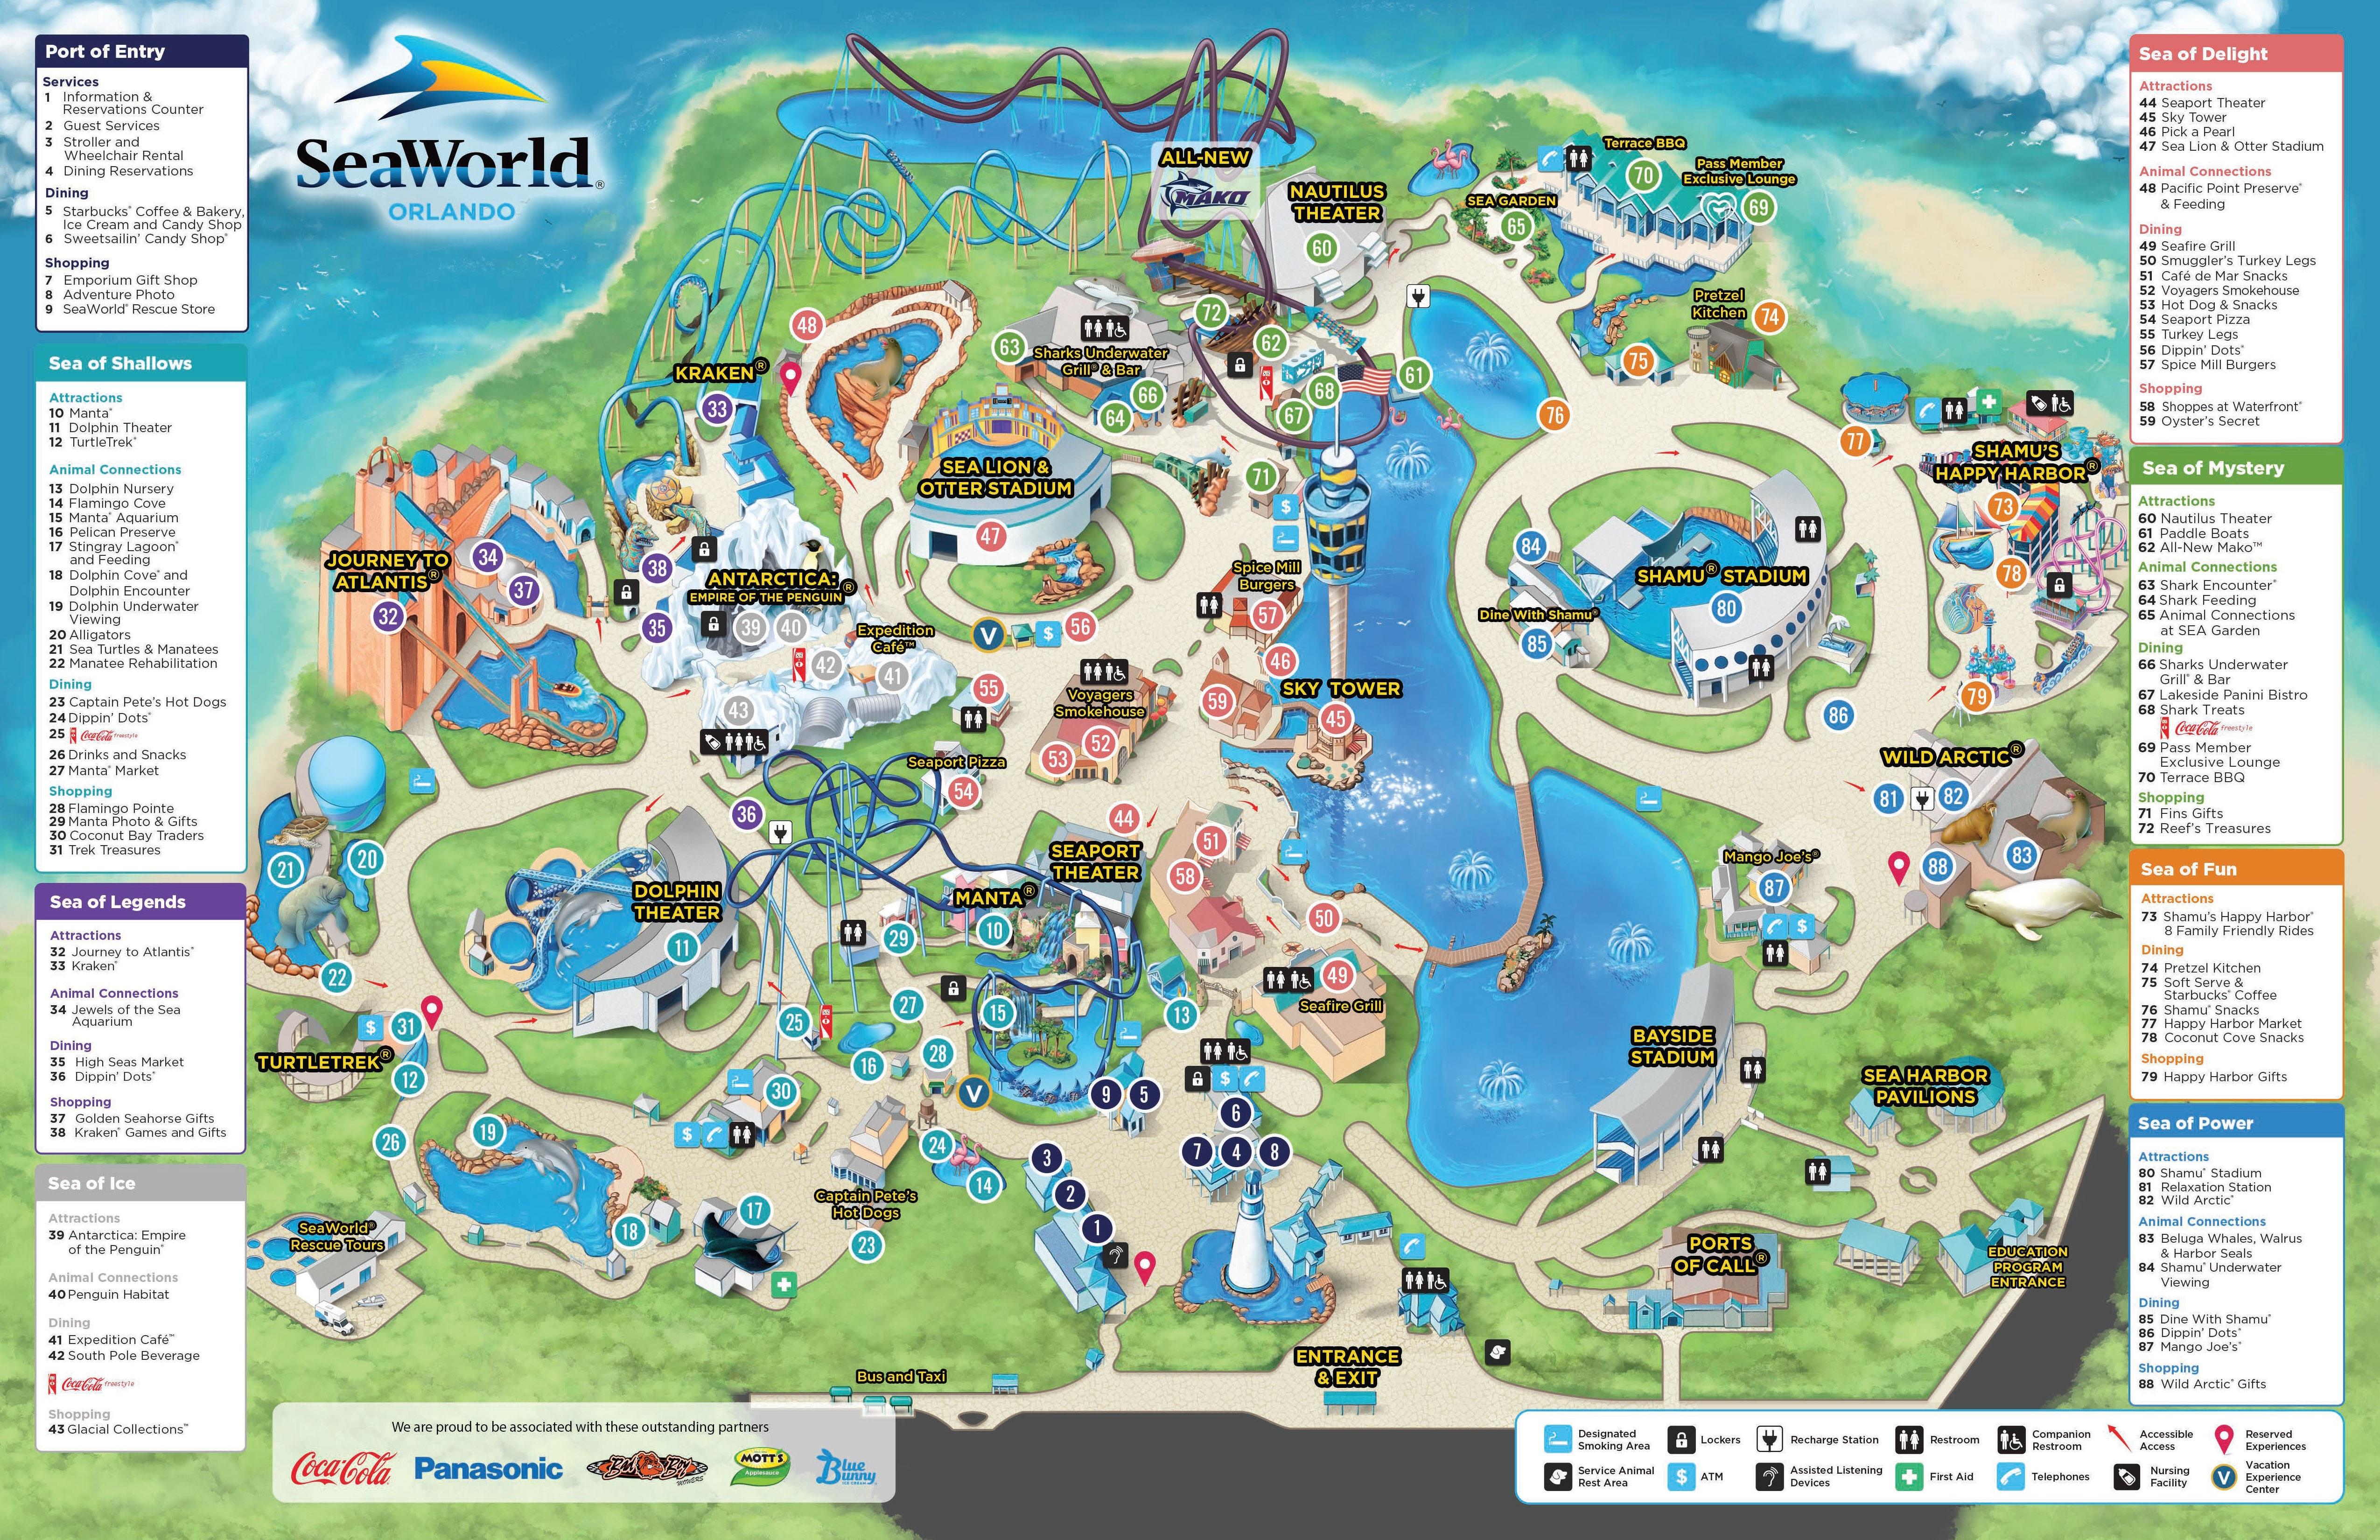 HIGHSTAR TRAVEL GROUP Helpful Information - Bush gardens park map